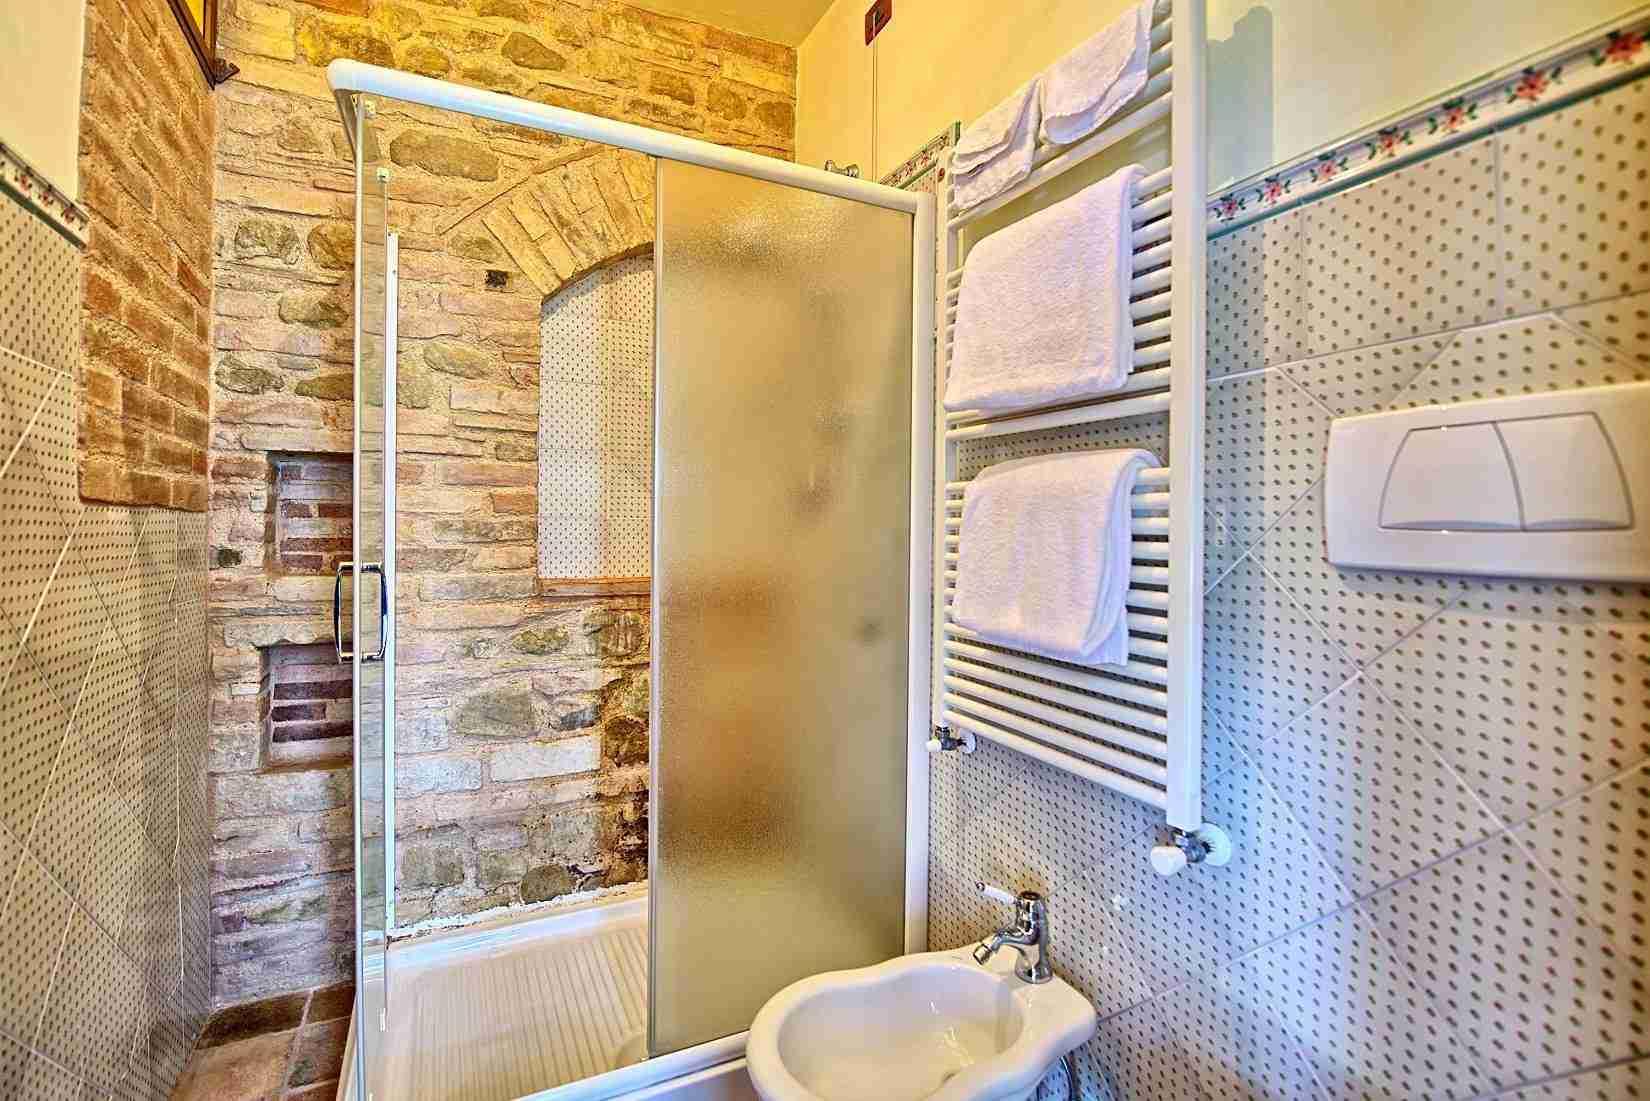 33 Assisi bathroom